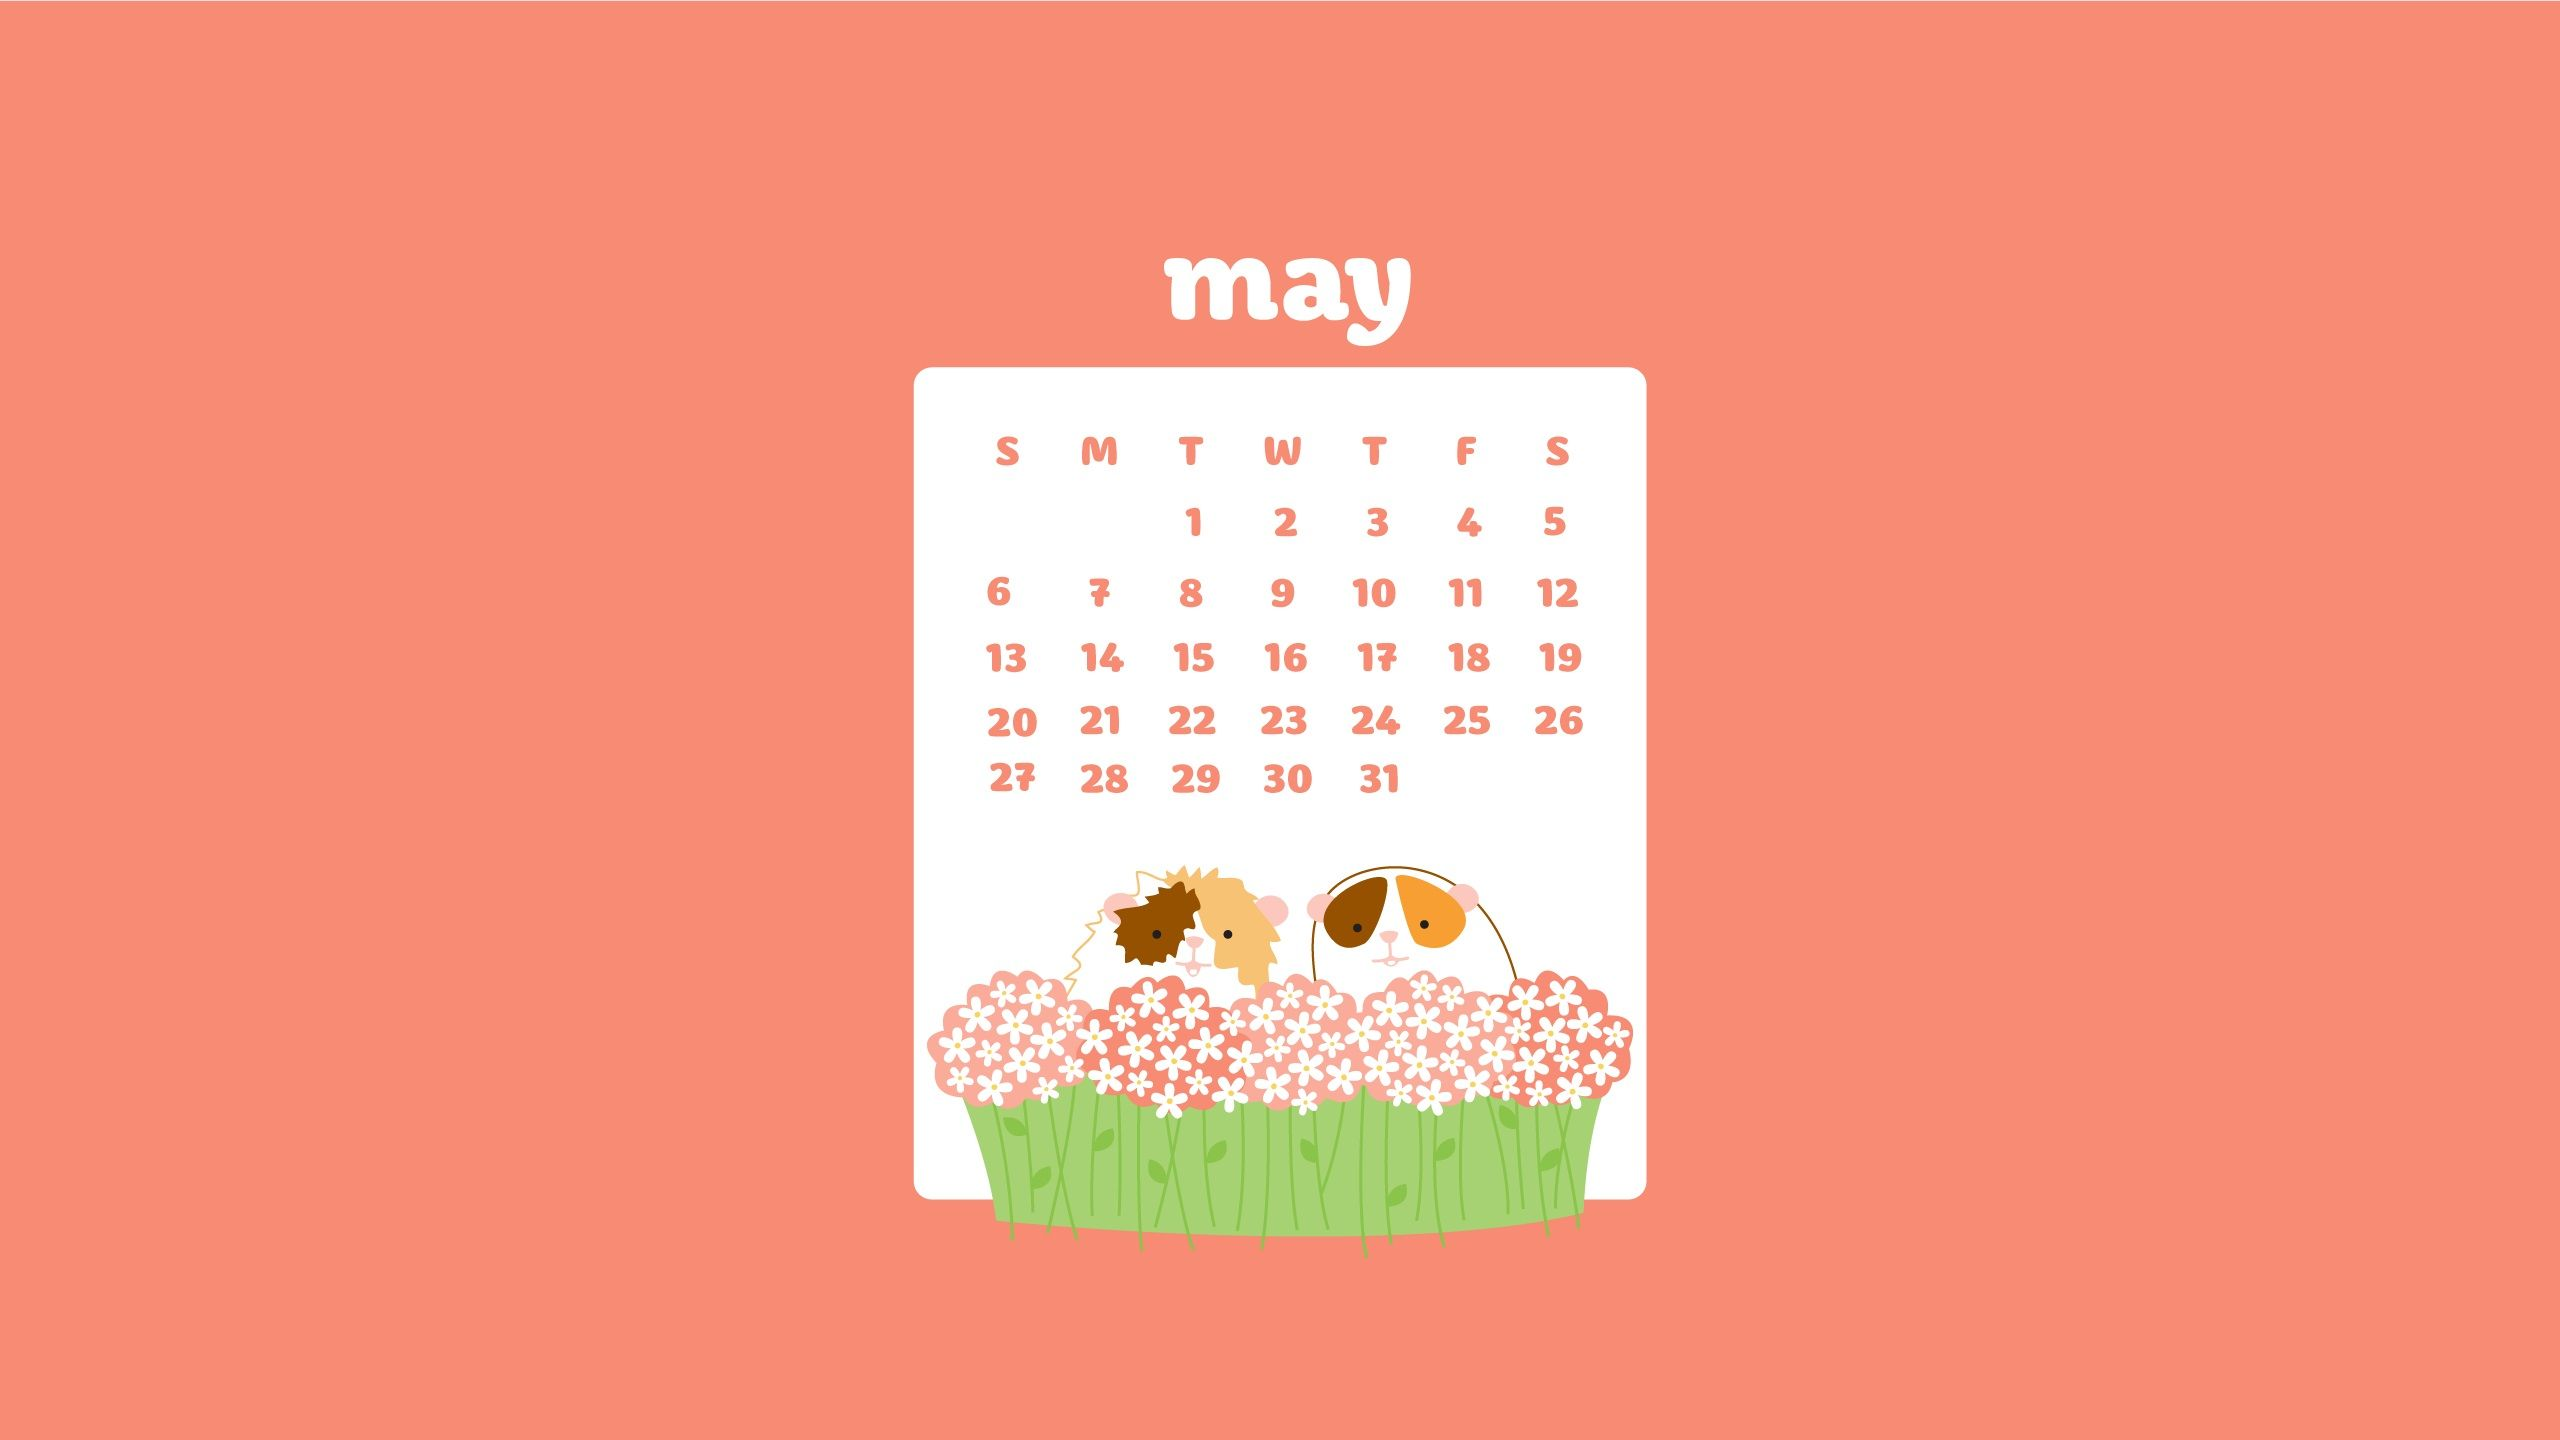 May Month 2018 Desktop Calendar